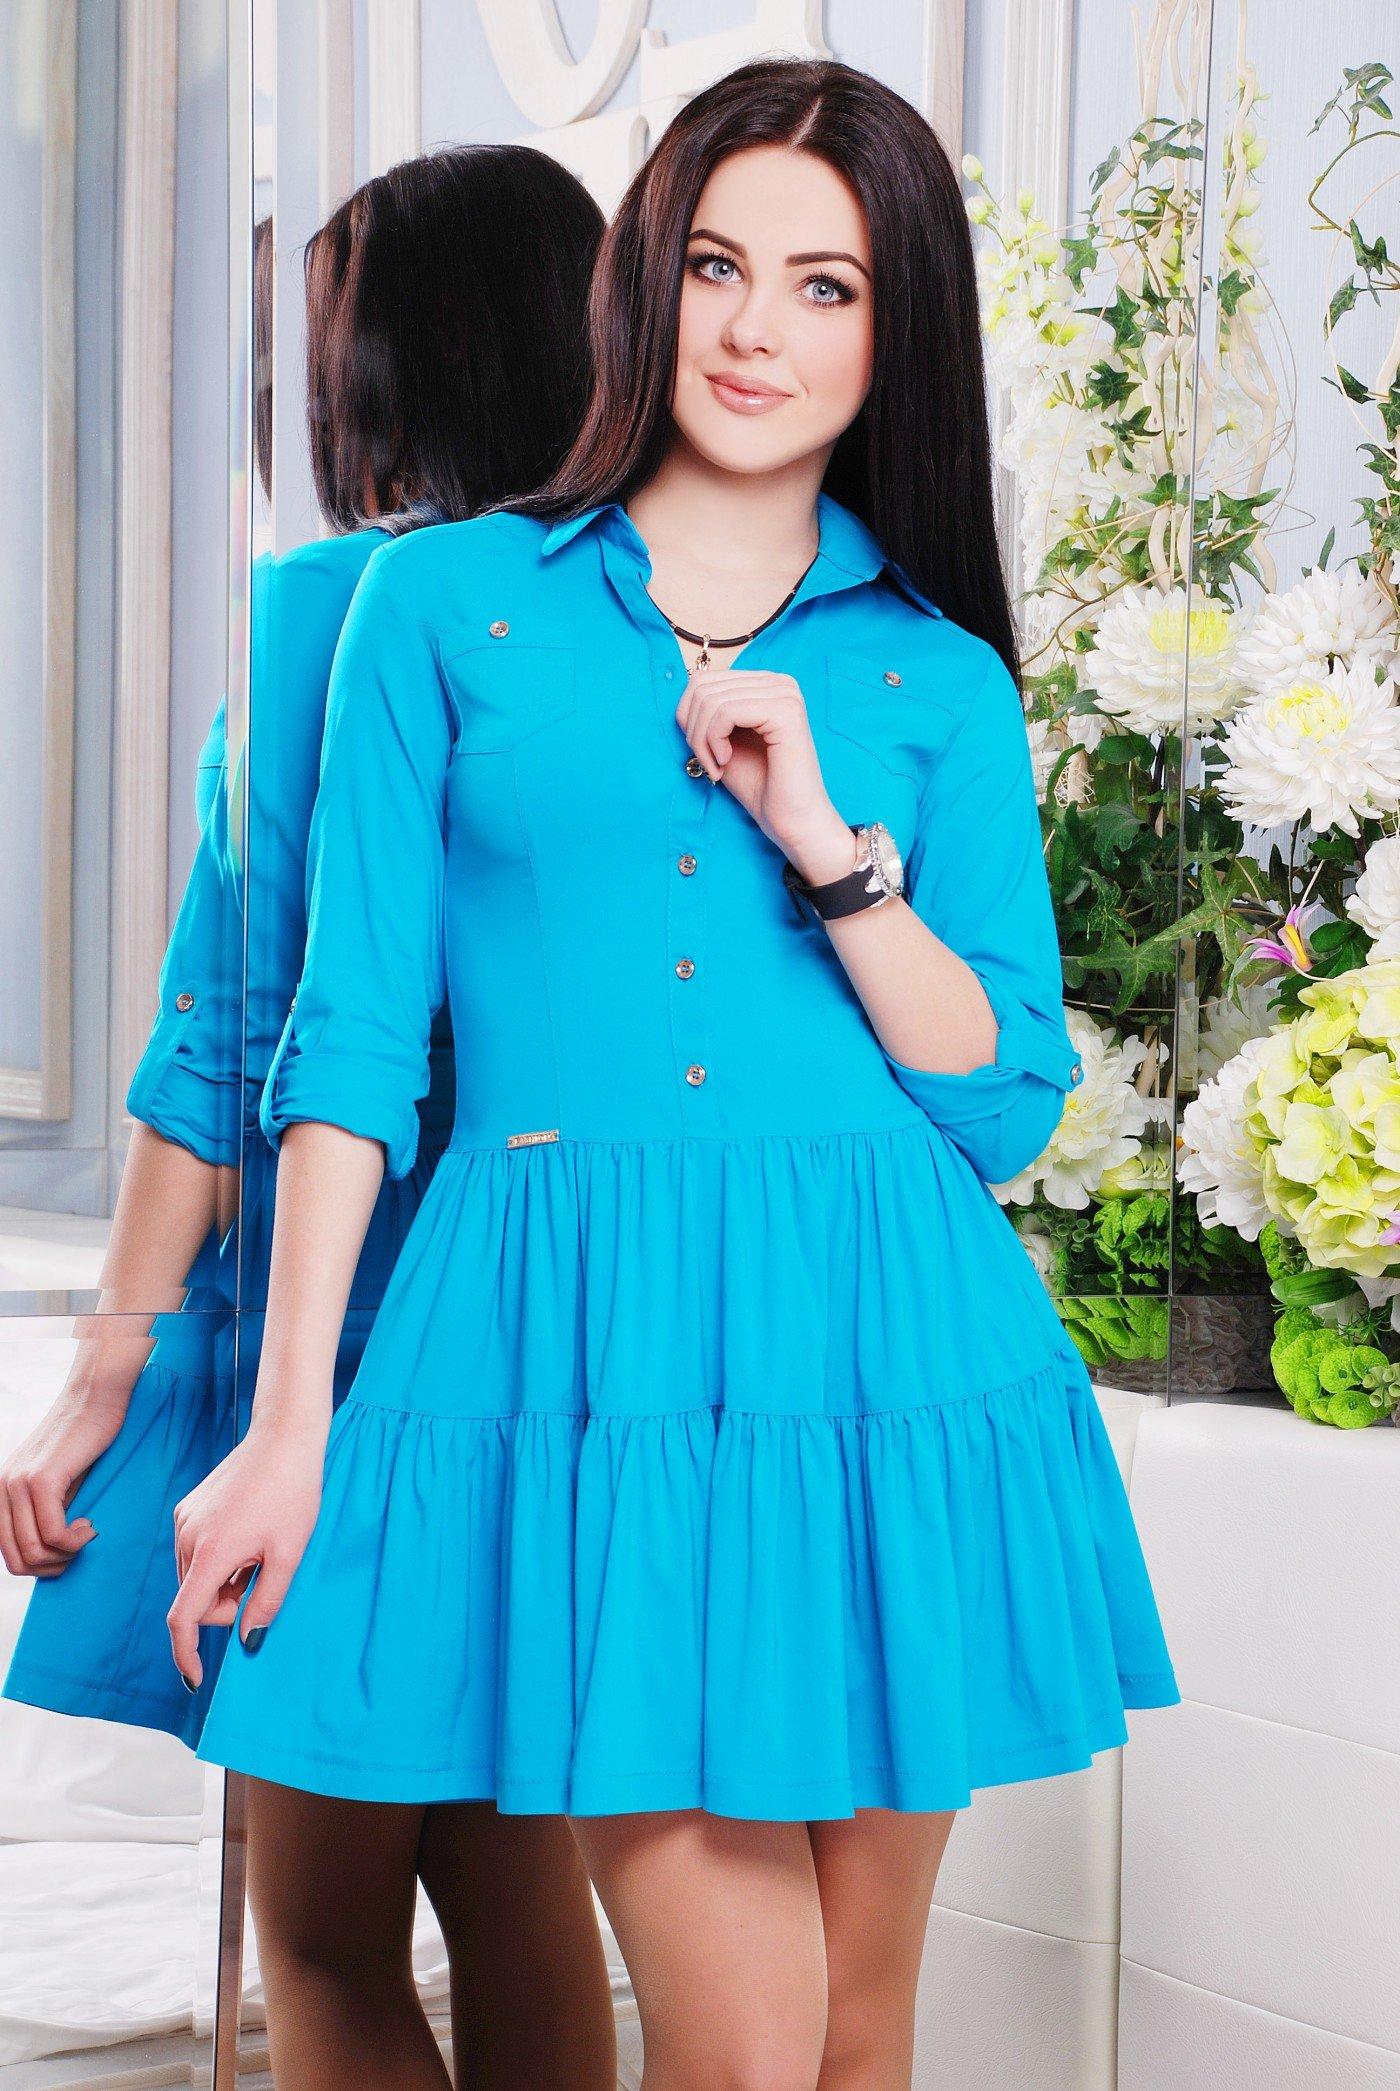 Яскраве жіноче блакитне плаття Фешн - купити недорого — Donna Bella ... 6ad4013ba22a1